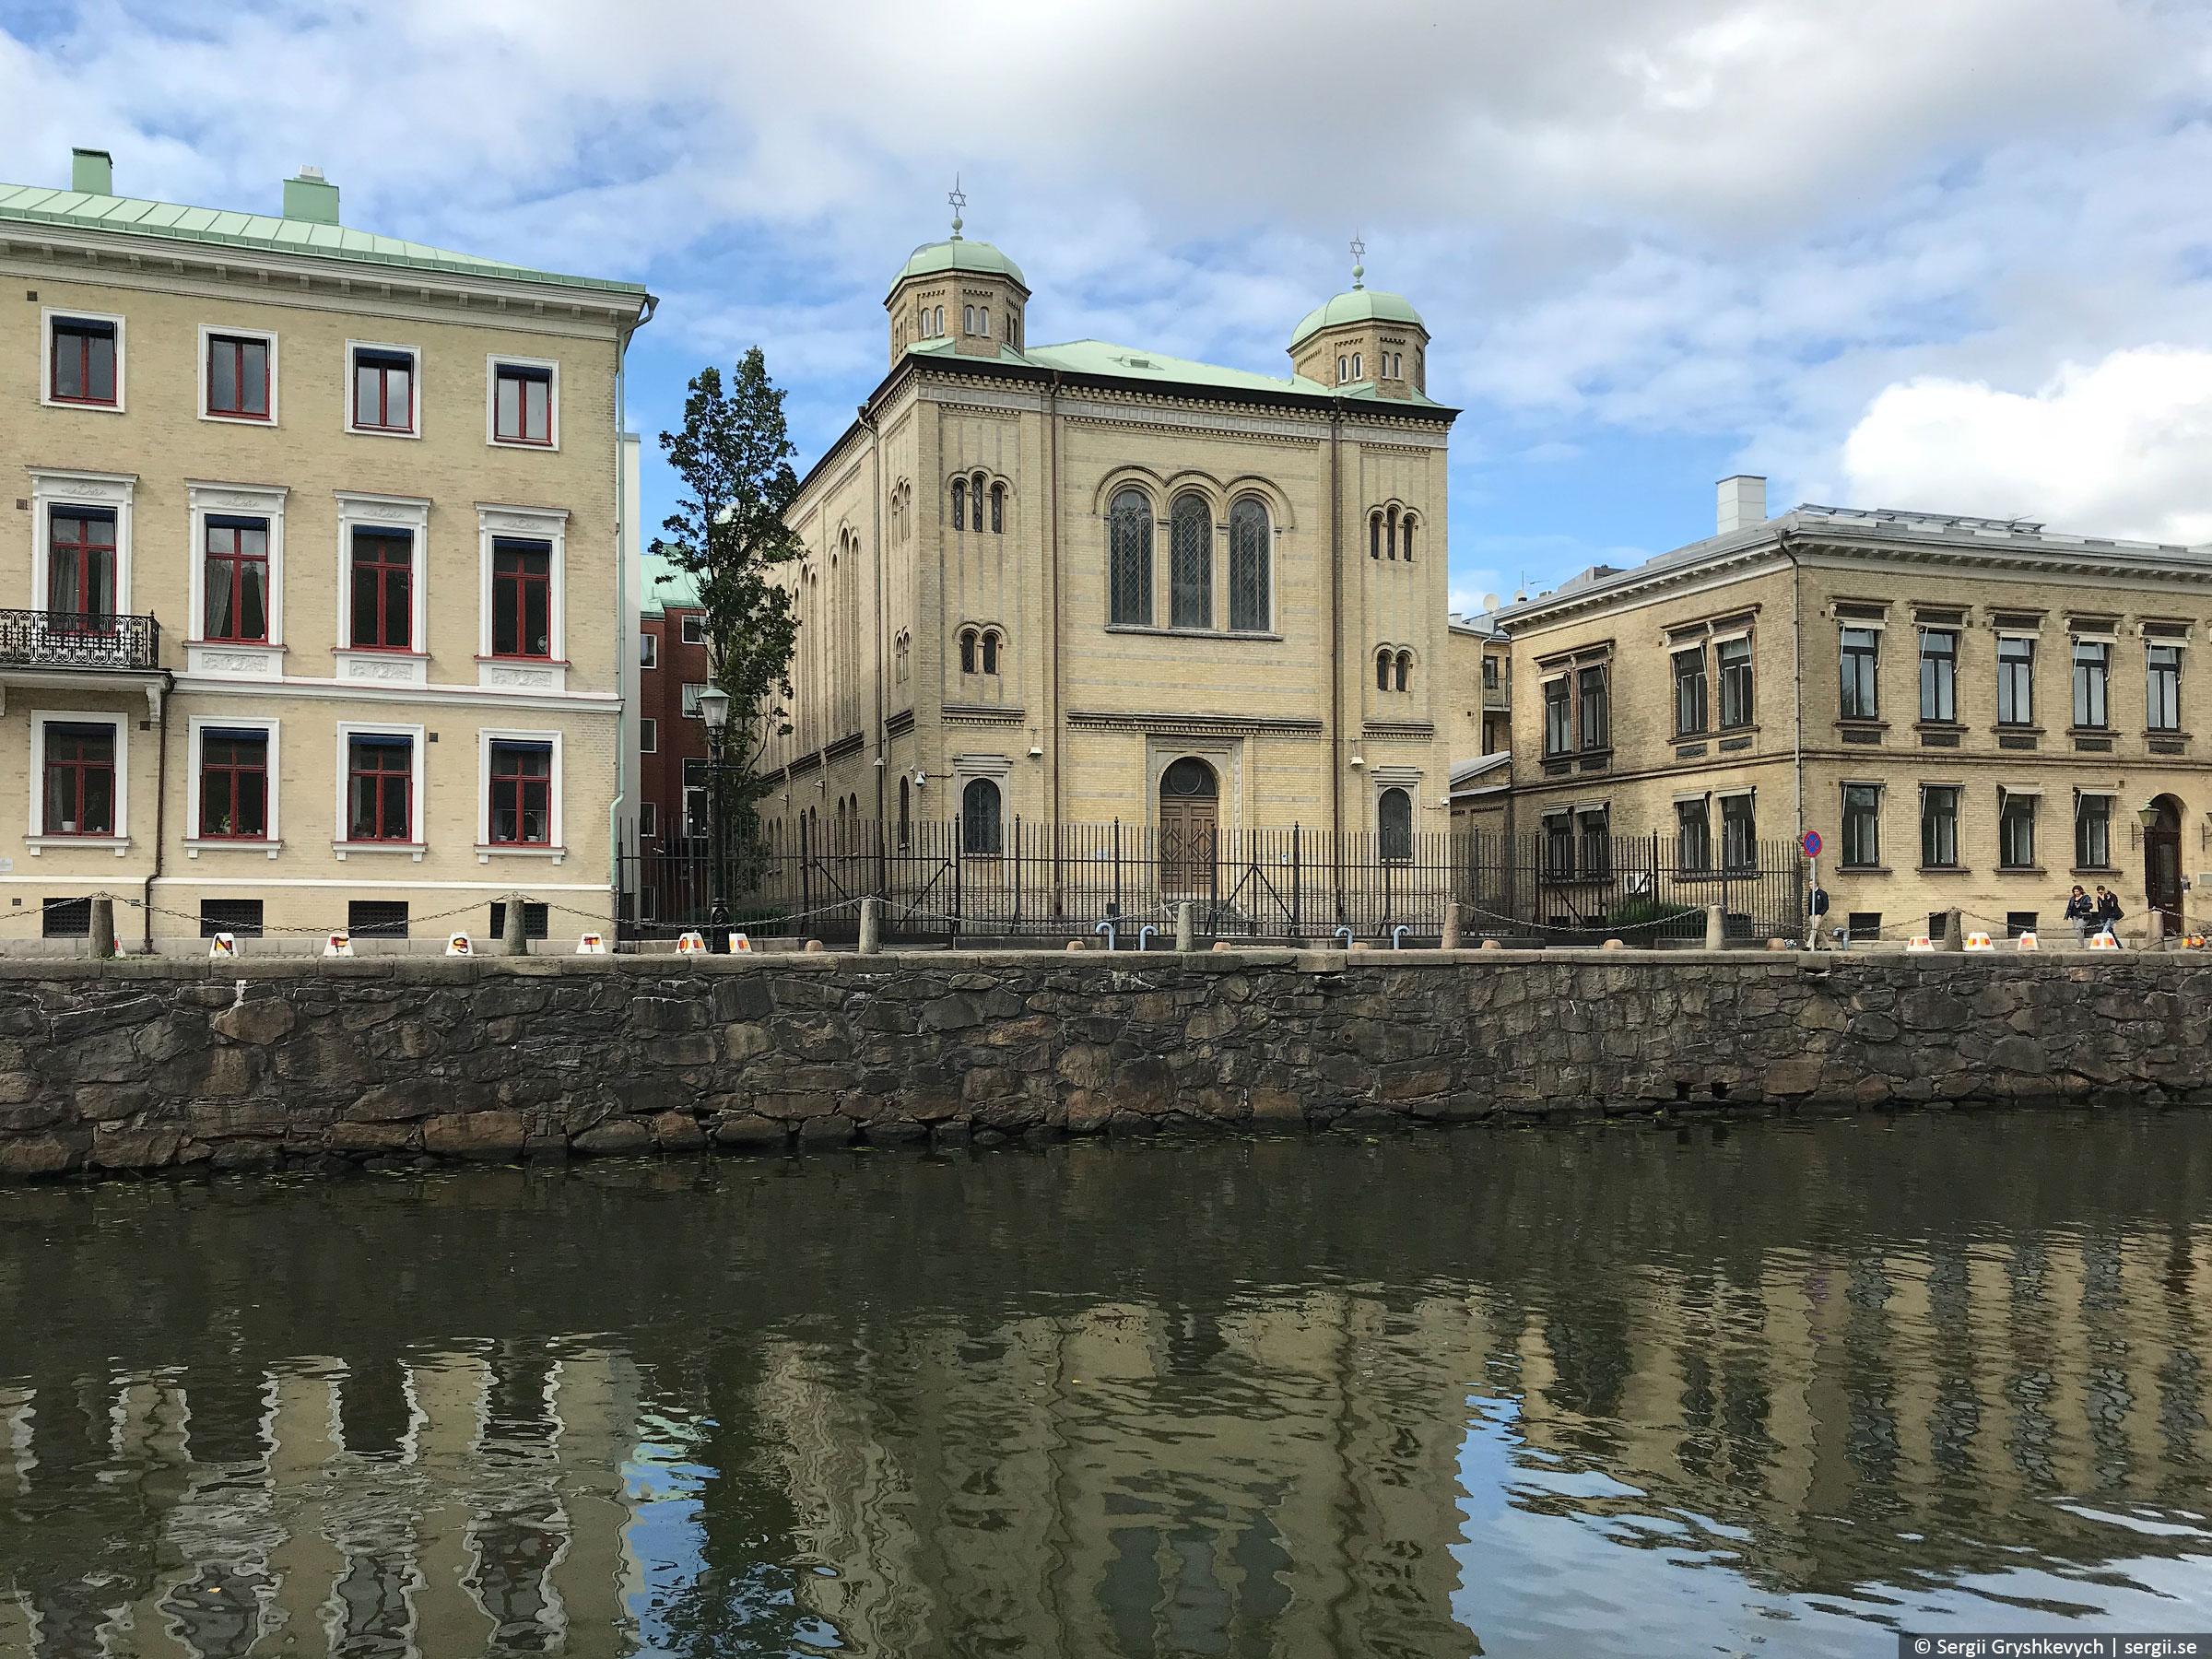 göteborg-ghotenburg-sweden-2018-52